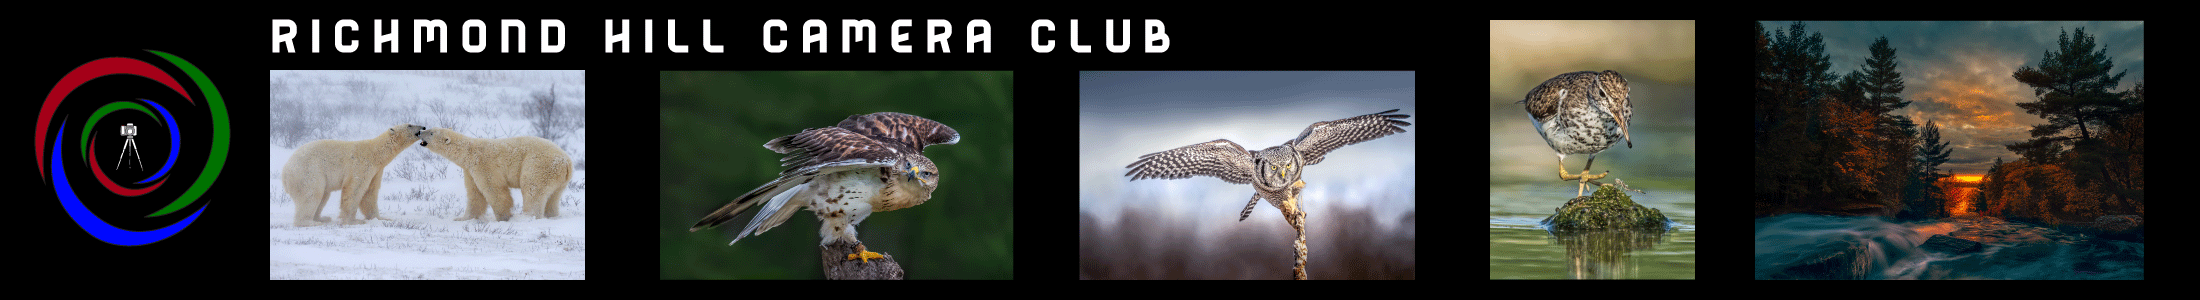 Richmond Hill Camera Club